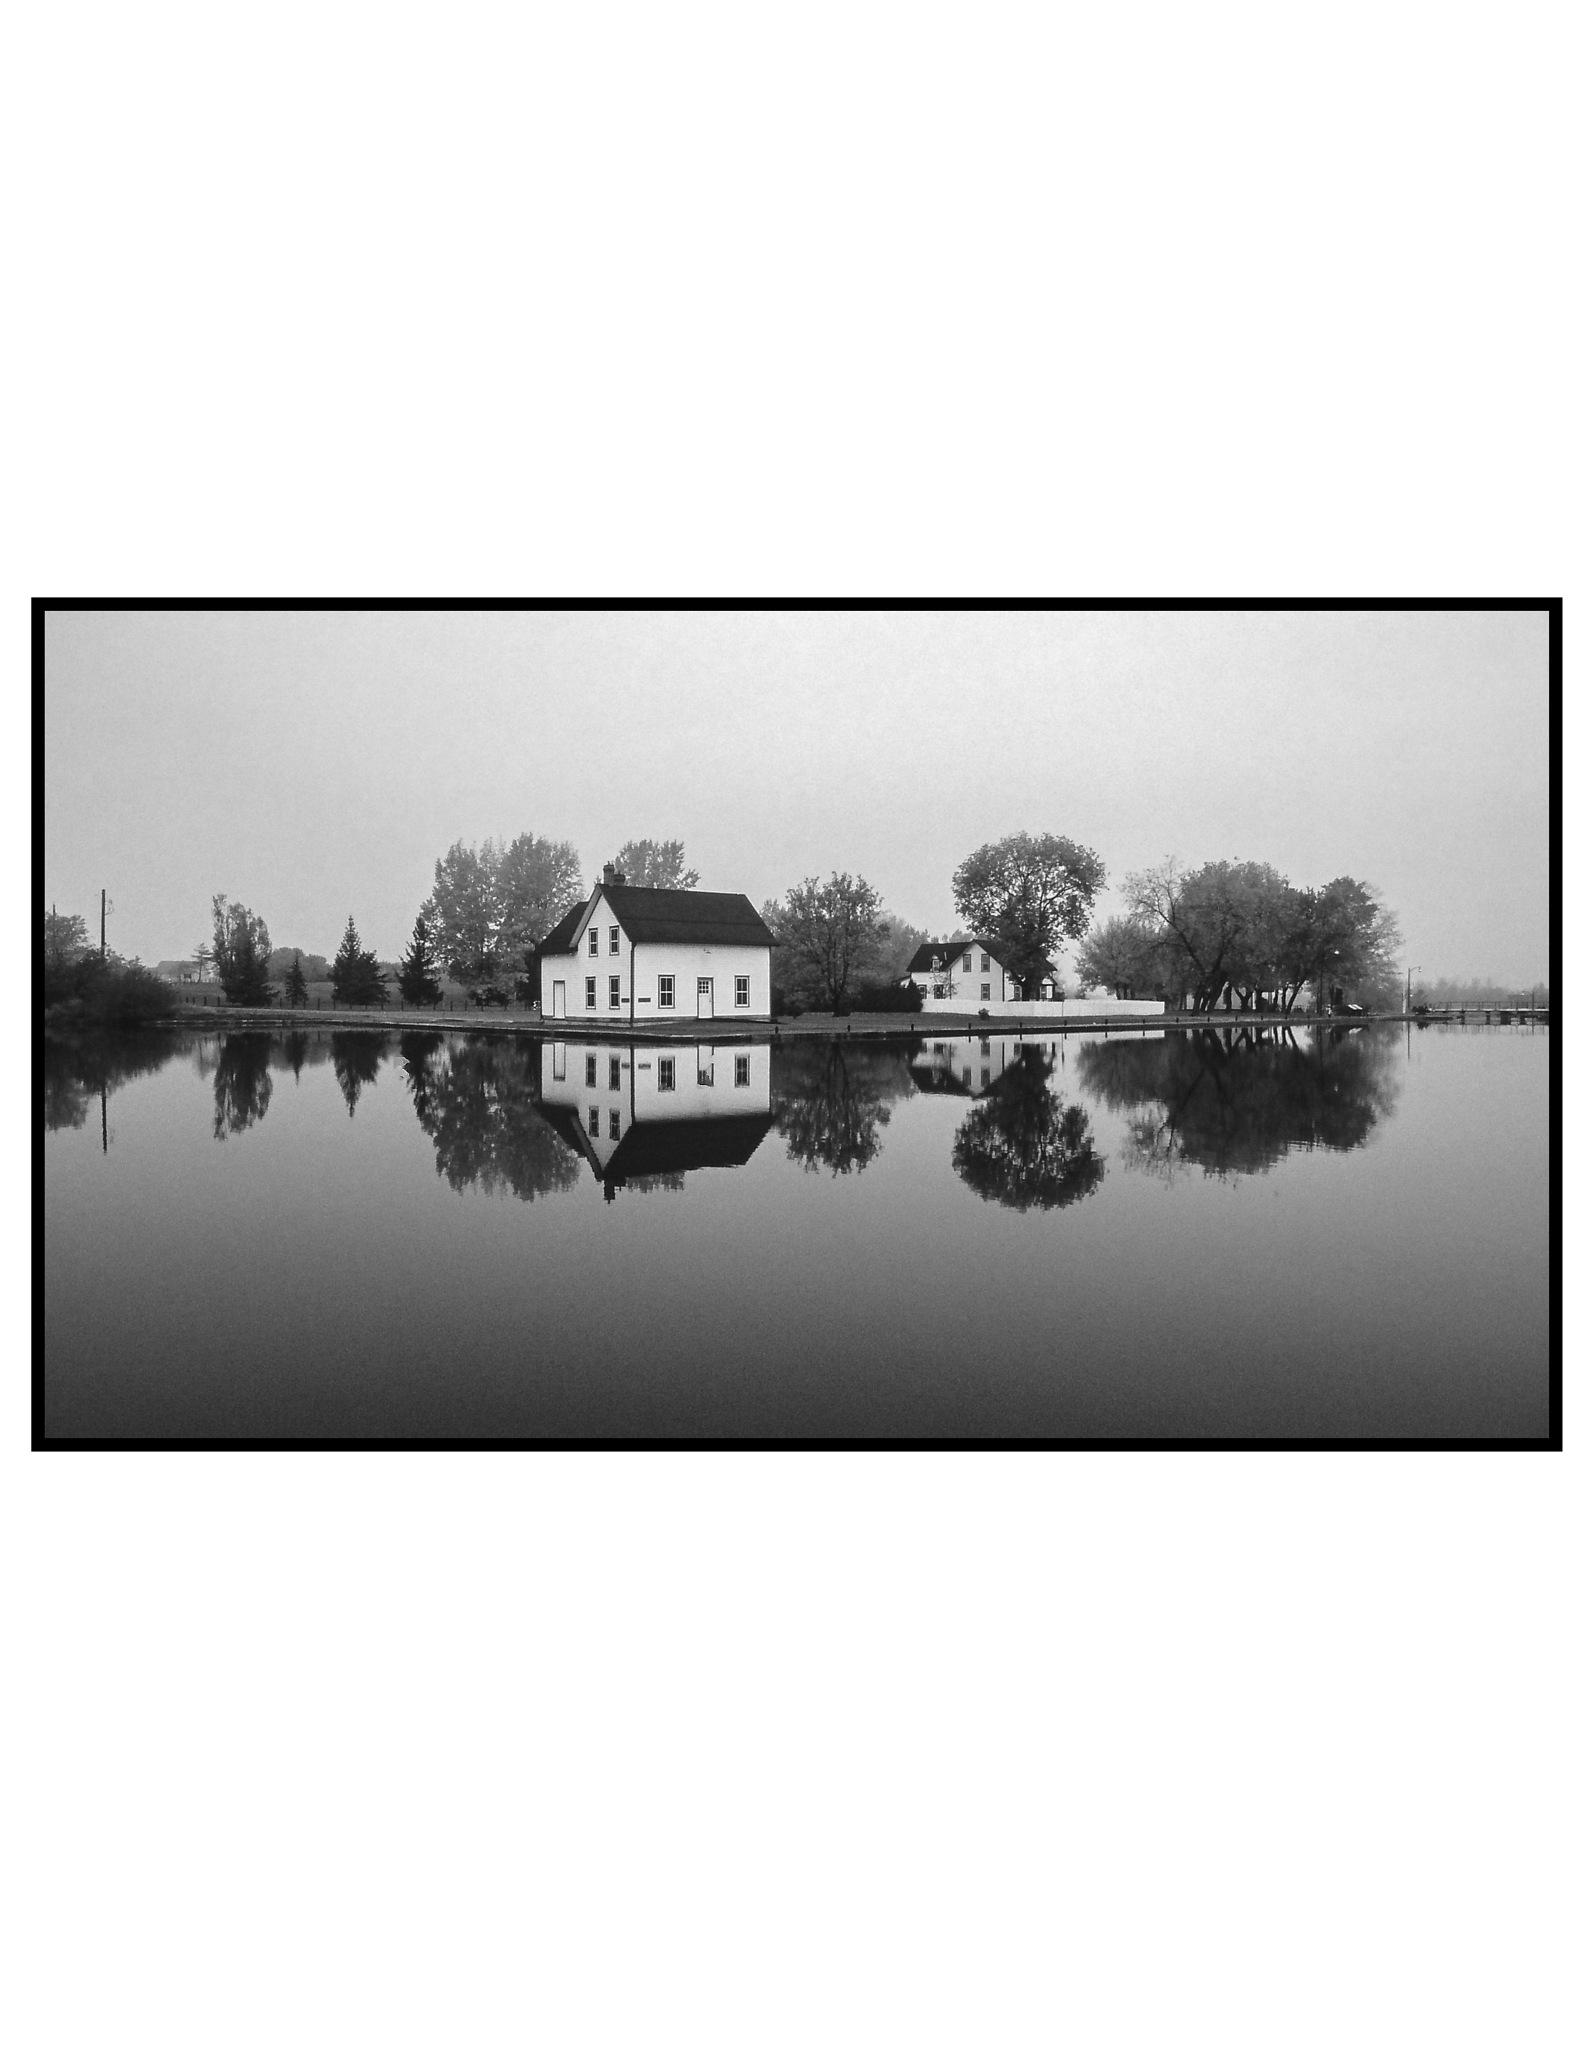 Quiet Reflection by Douglas Burch